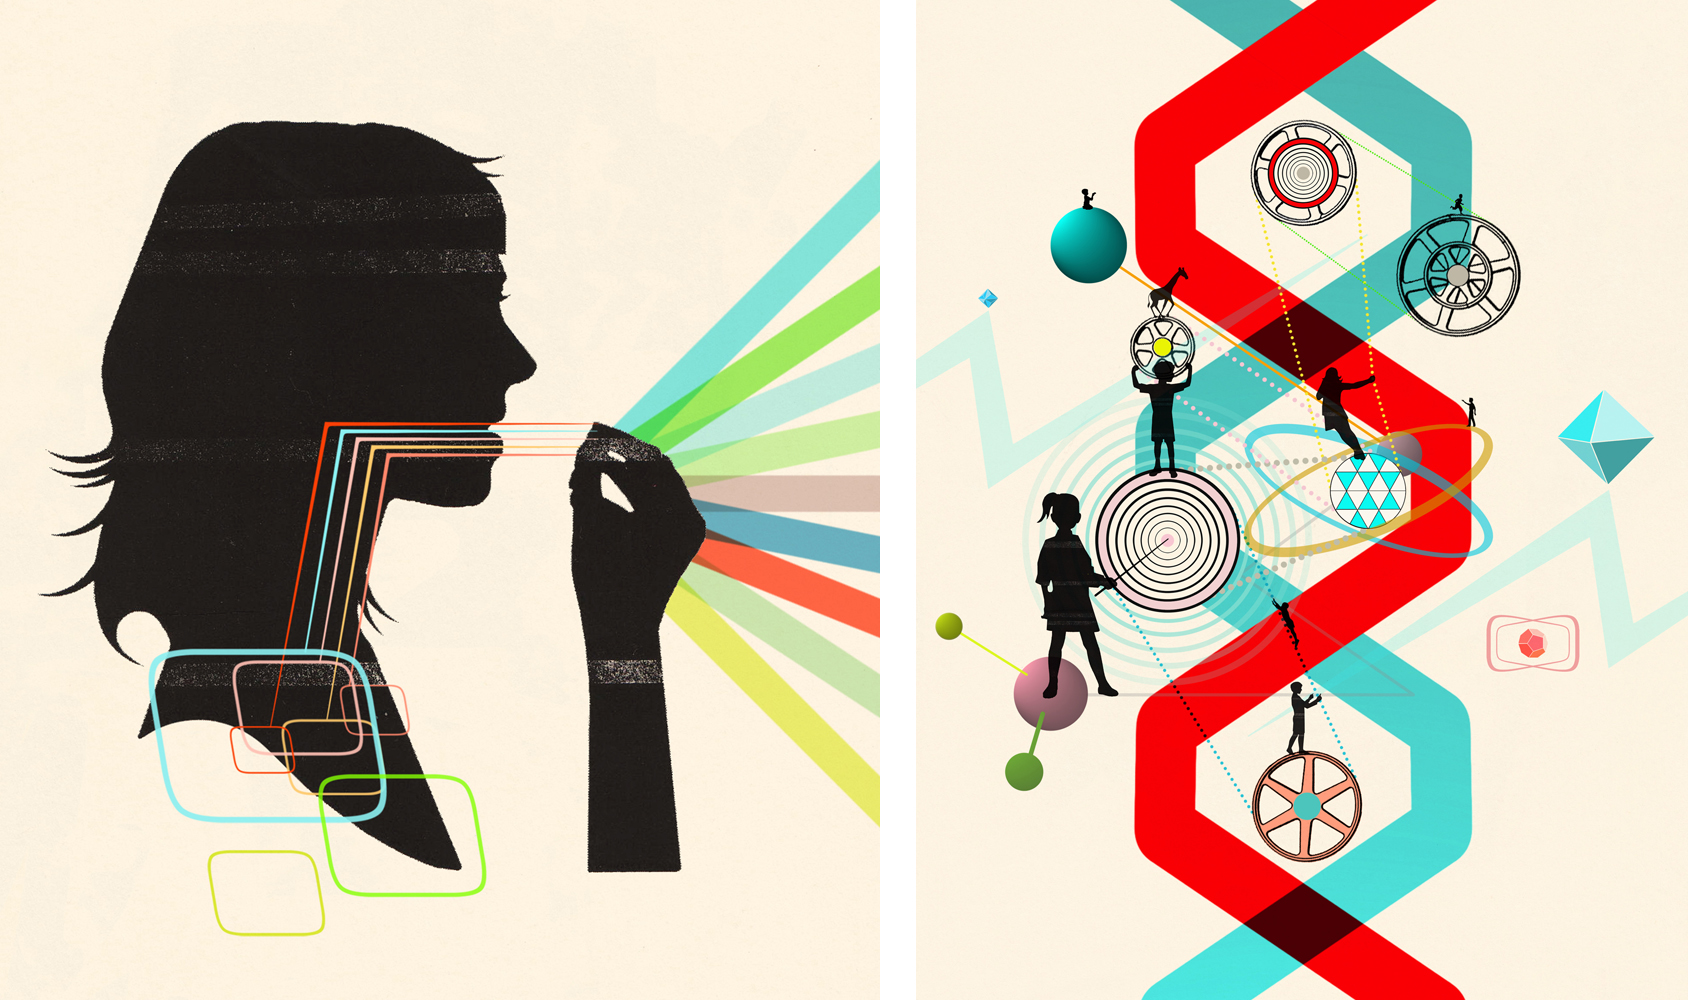 Mark-Allen-Miller-Illustration-2.jpeg